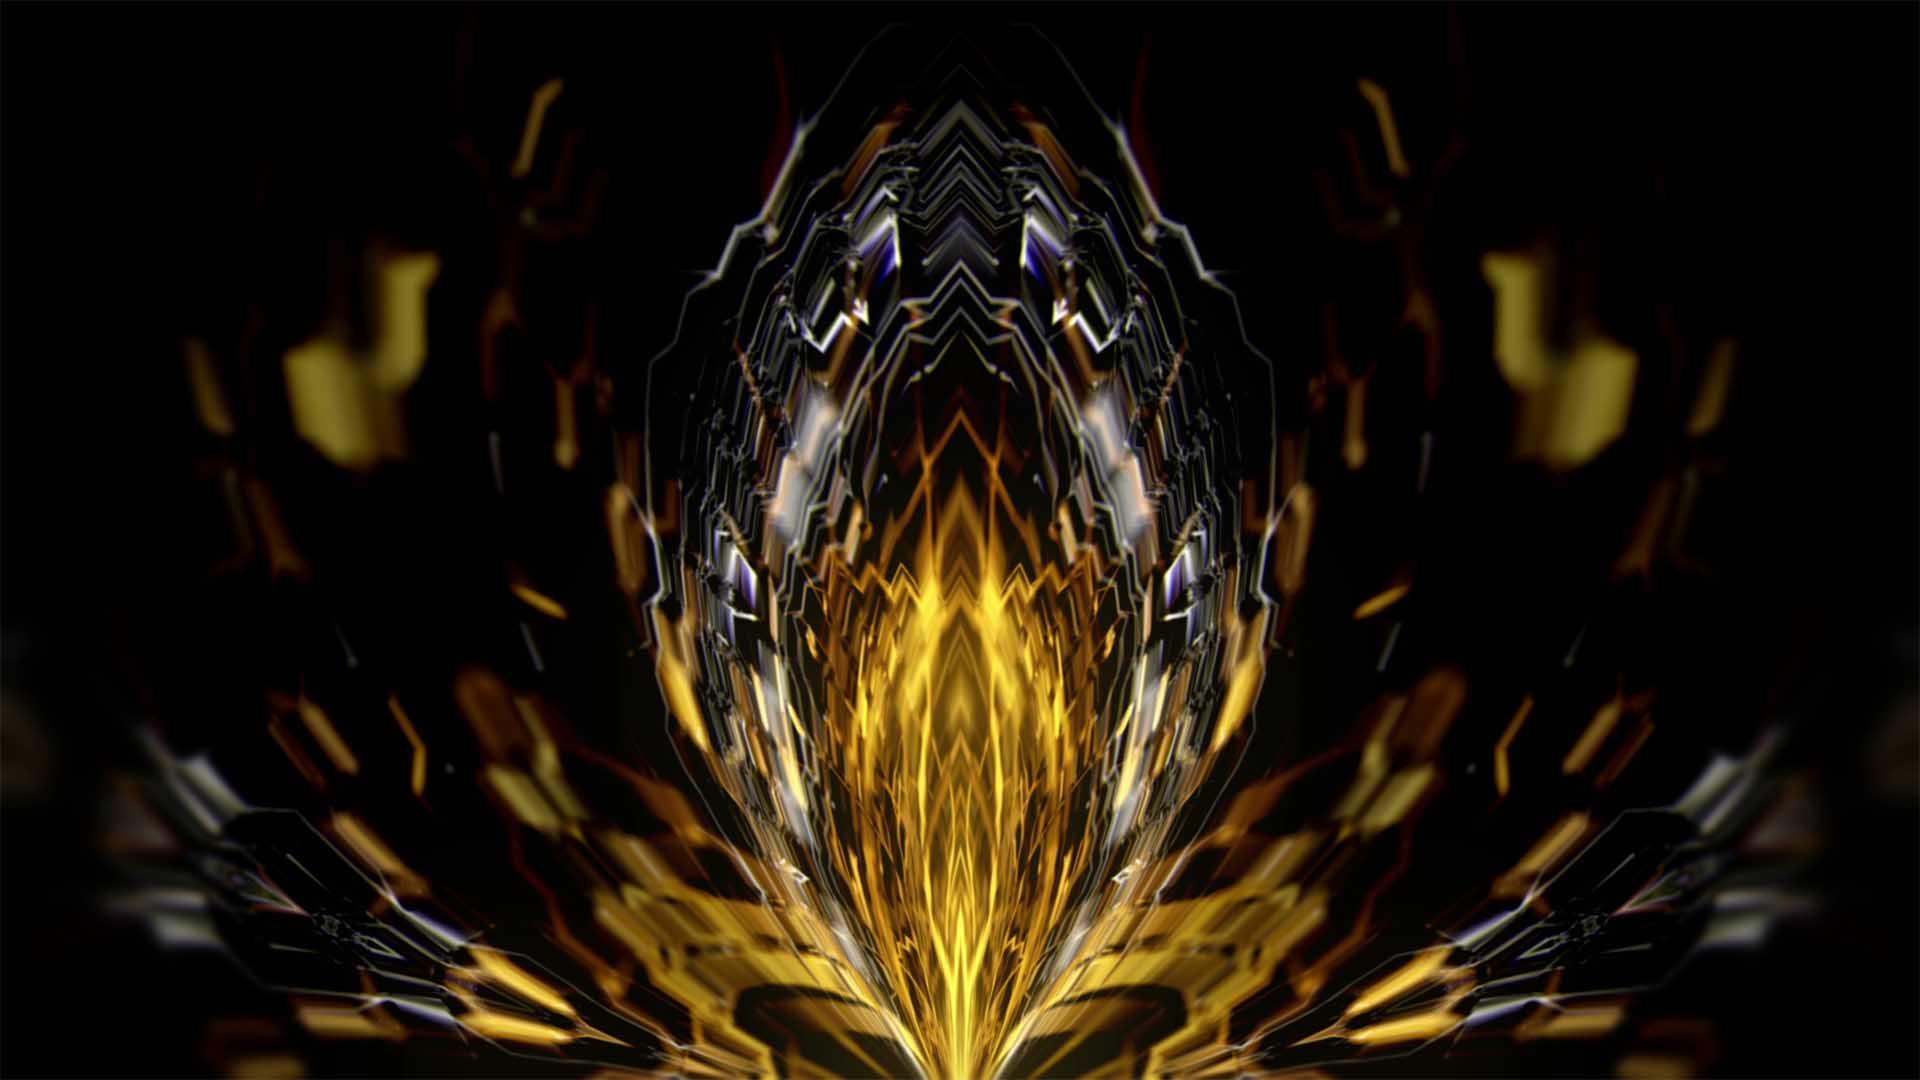 gold pattern motion background